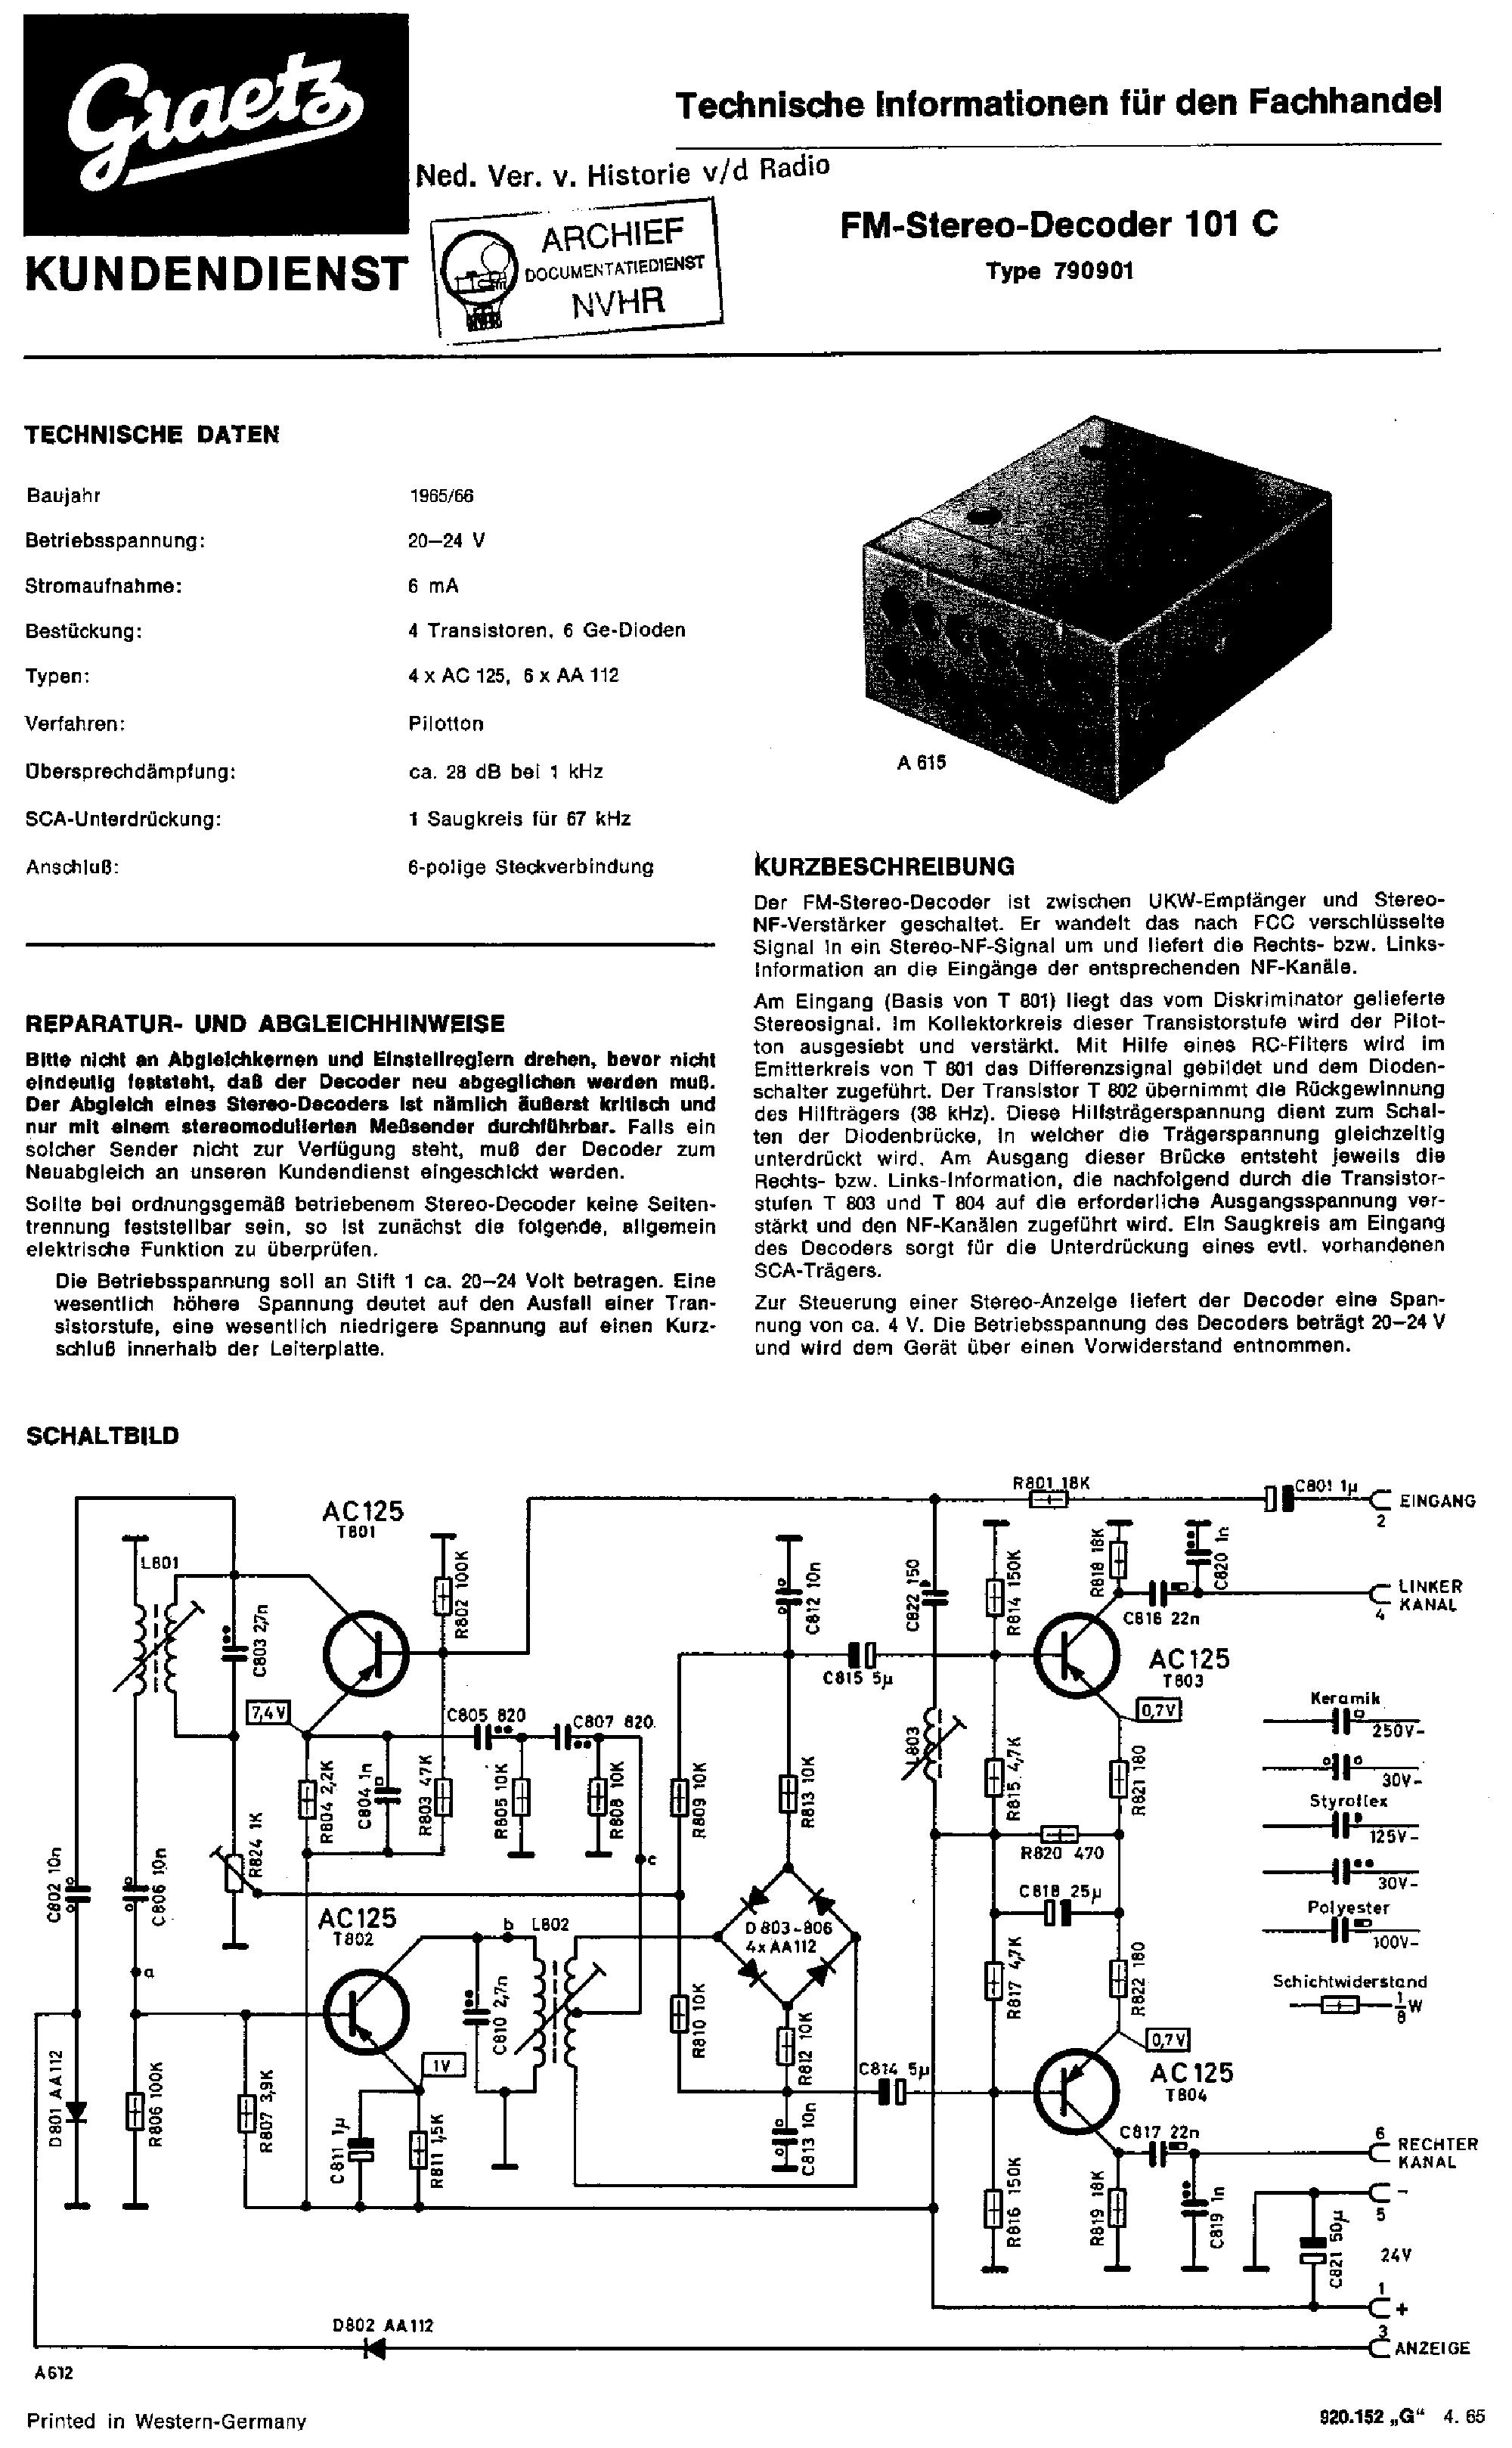 Fm Stereo Decoder Circuit Diagram And Schematics Lm1800 Graetz 101c 1965 Sch Service Manual